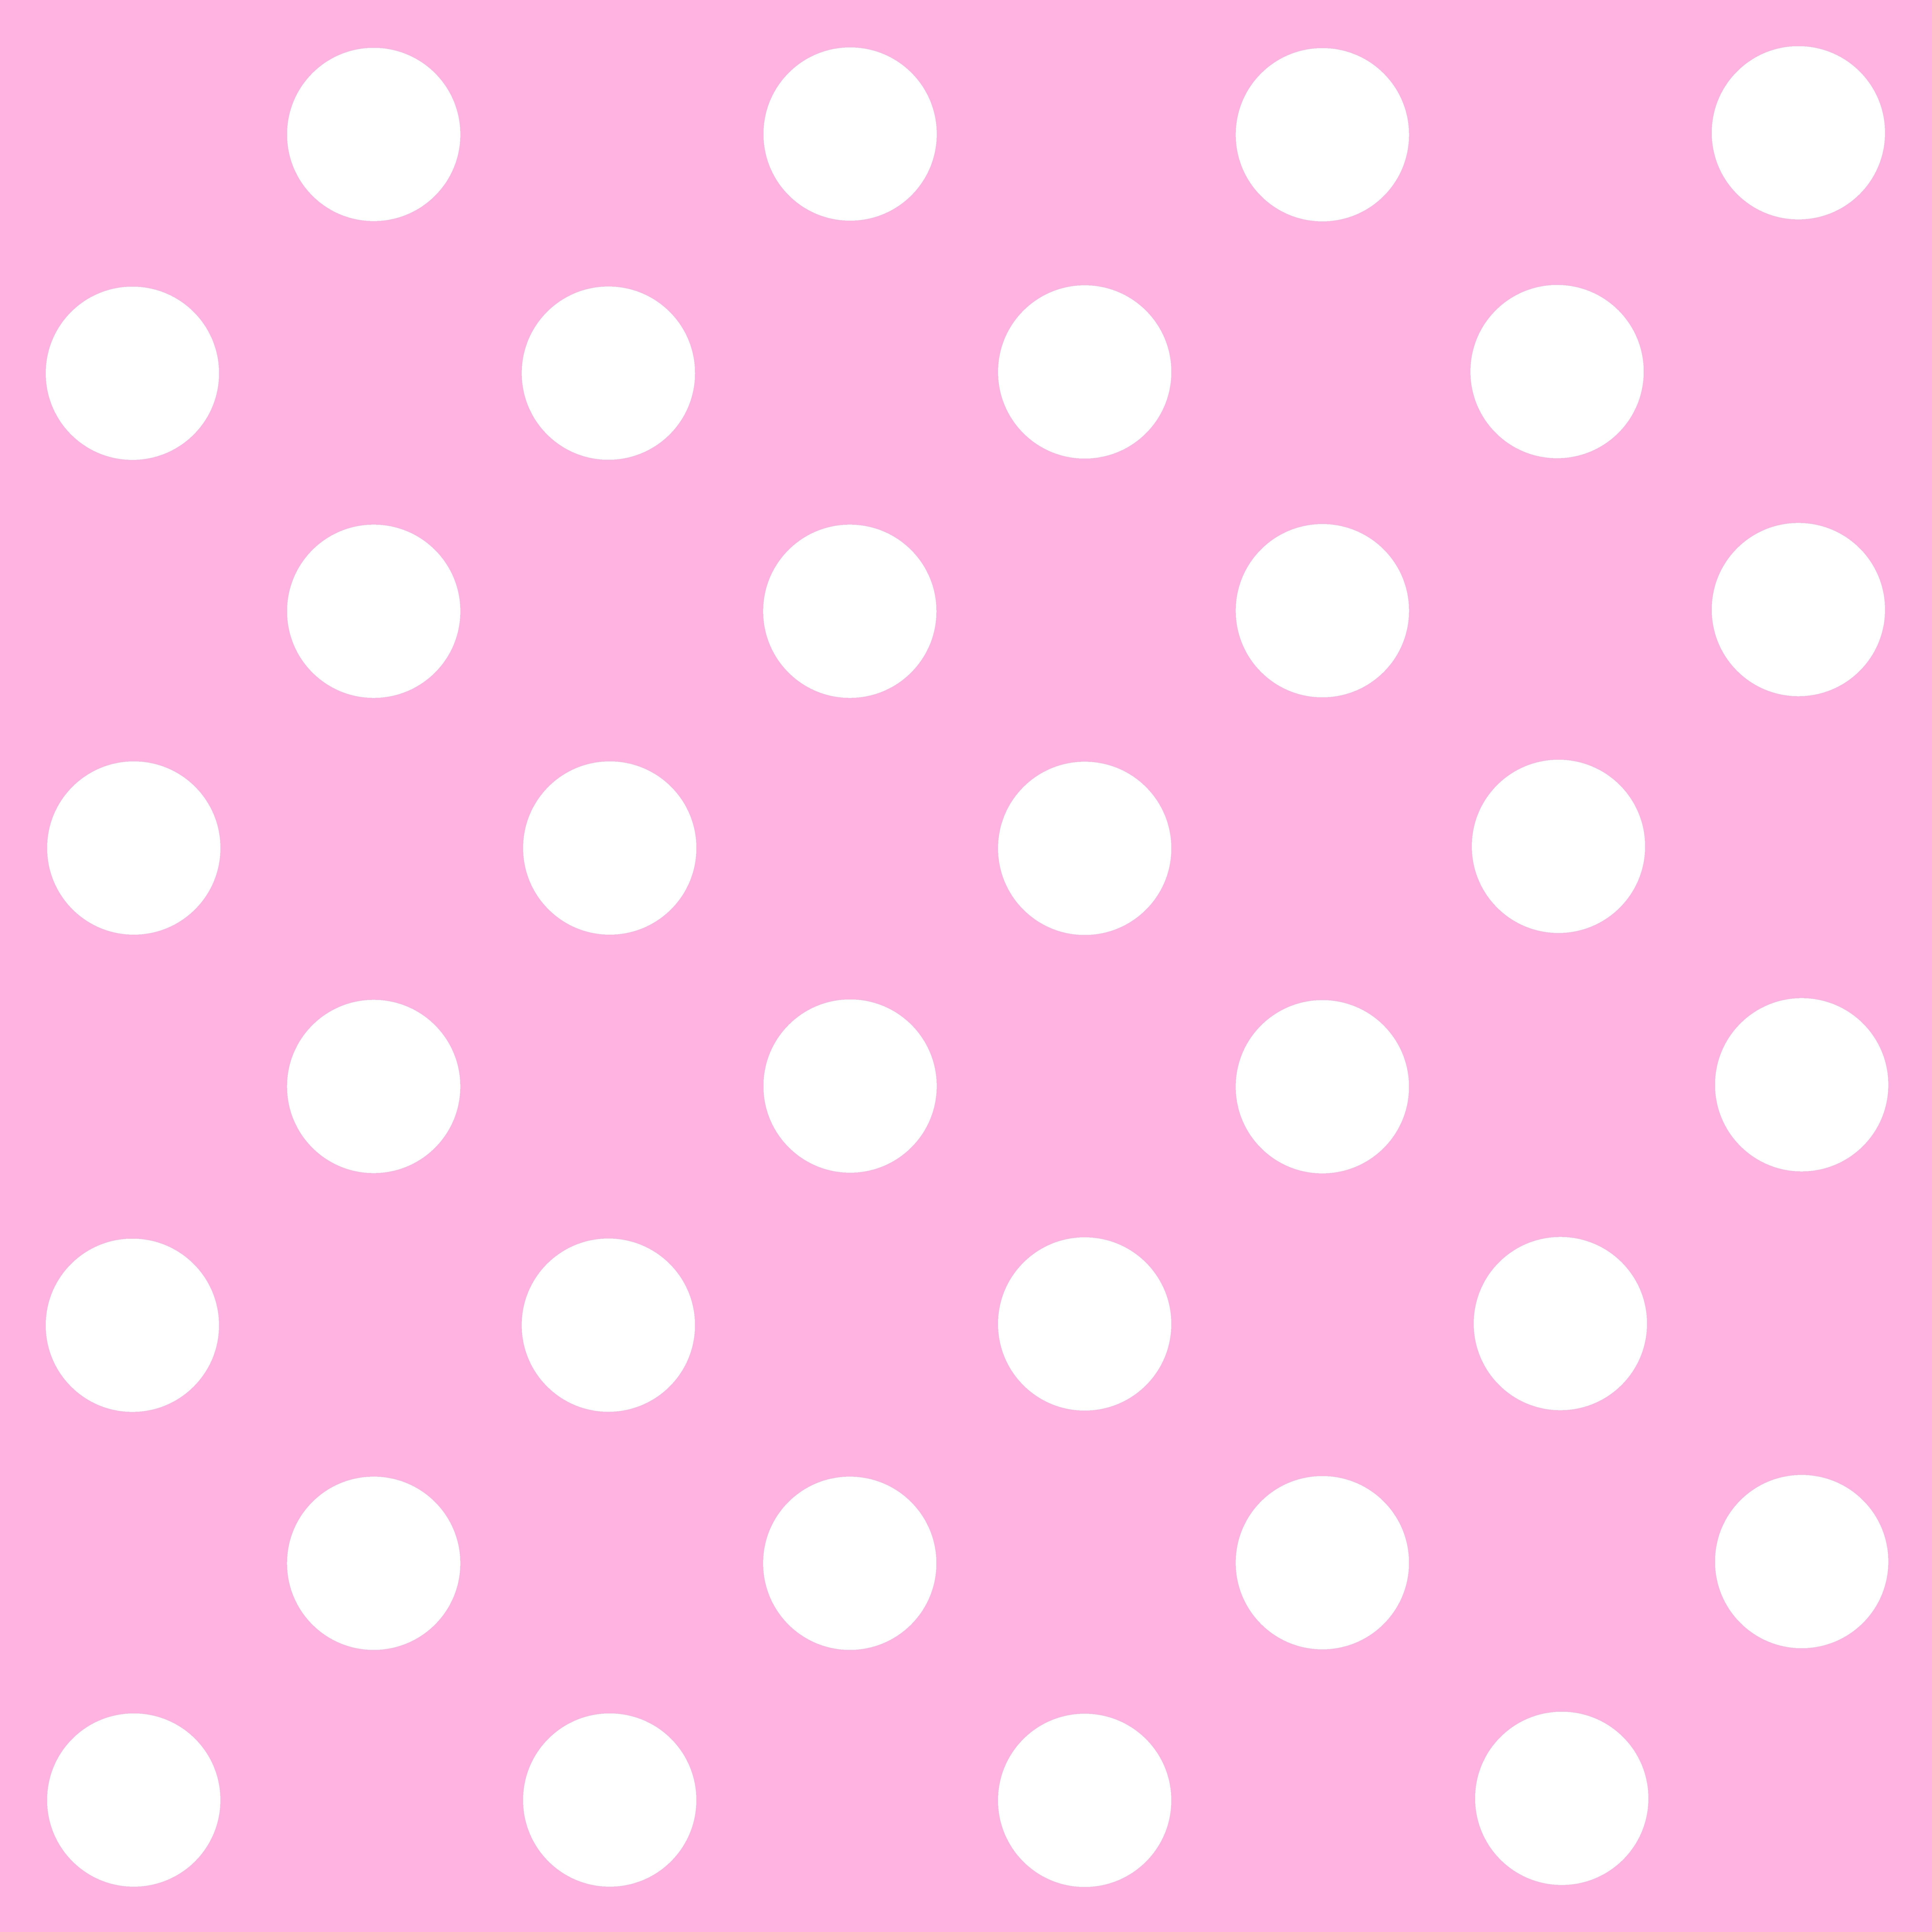 Pink And White Polka Dots .-Pink and White Polka Dots .-7